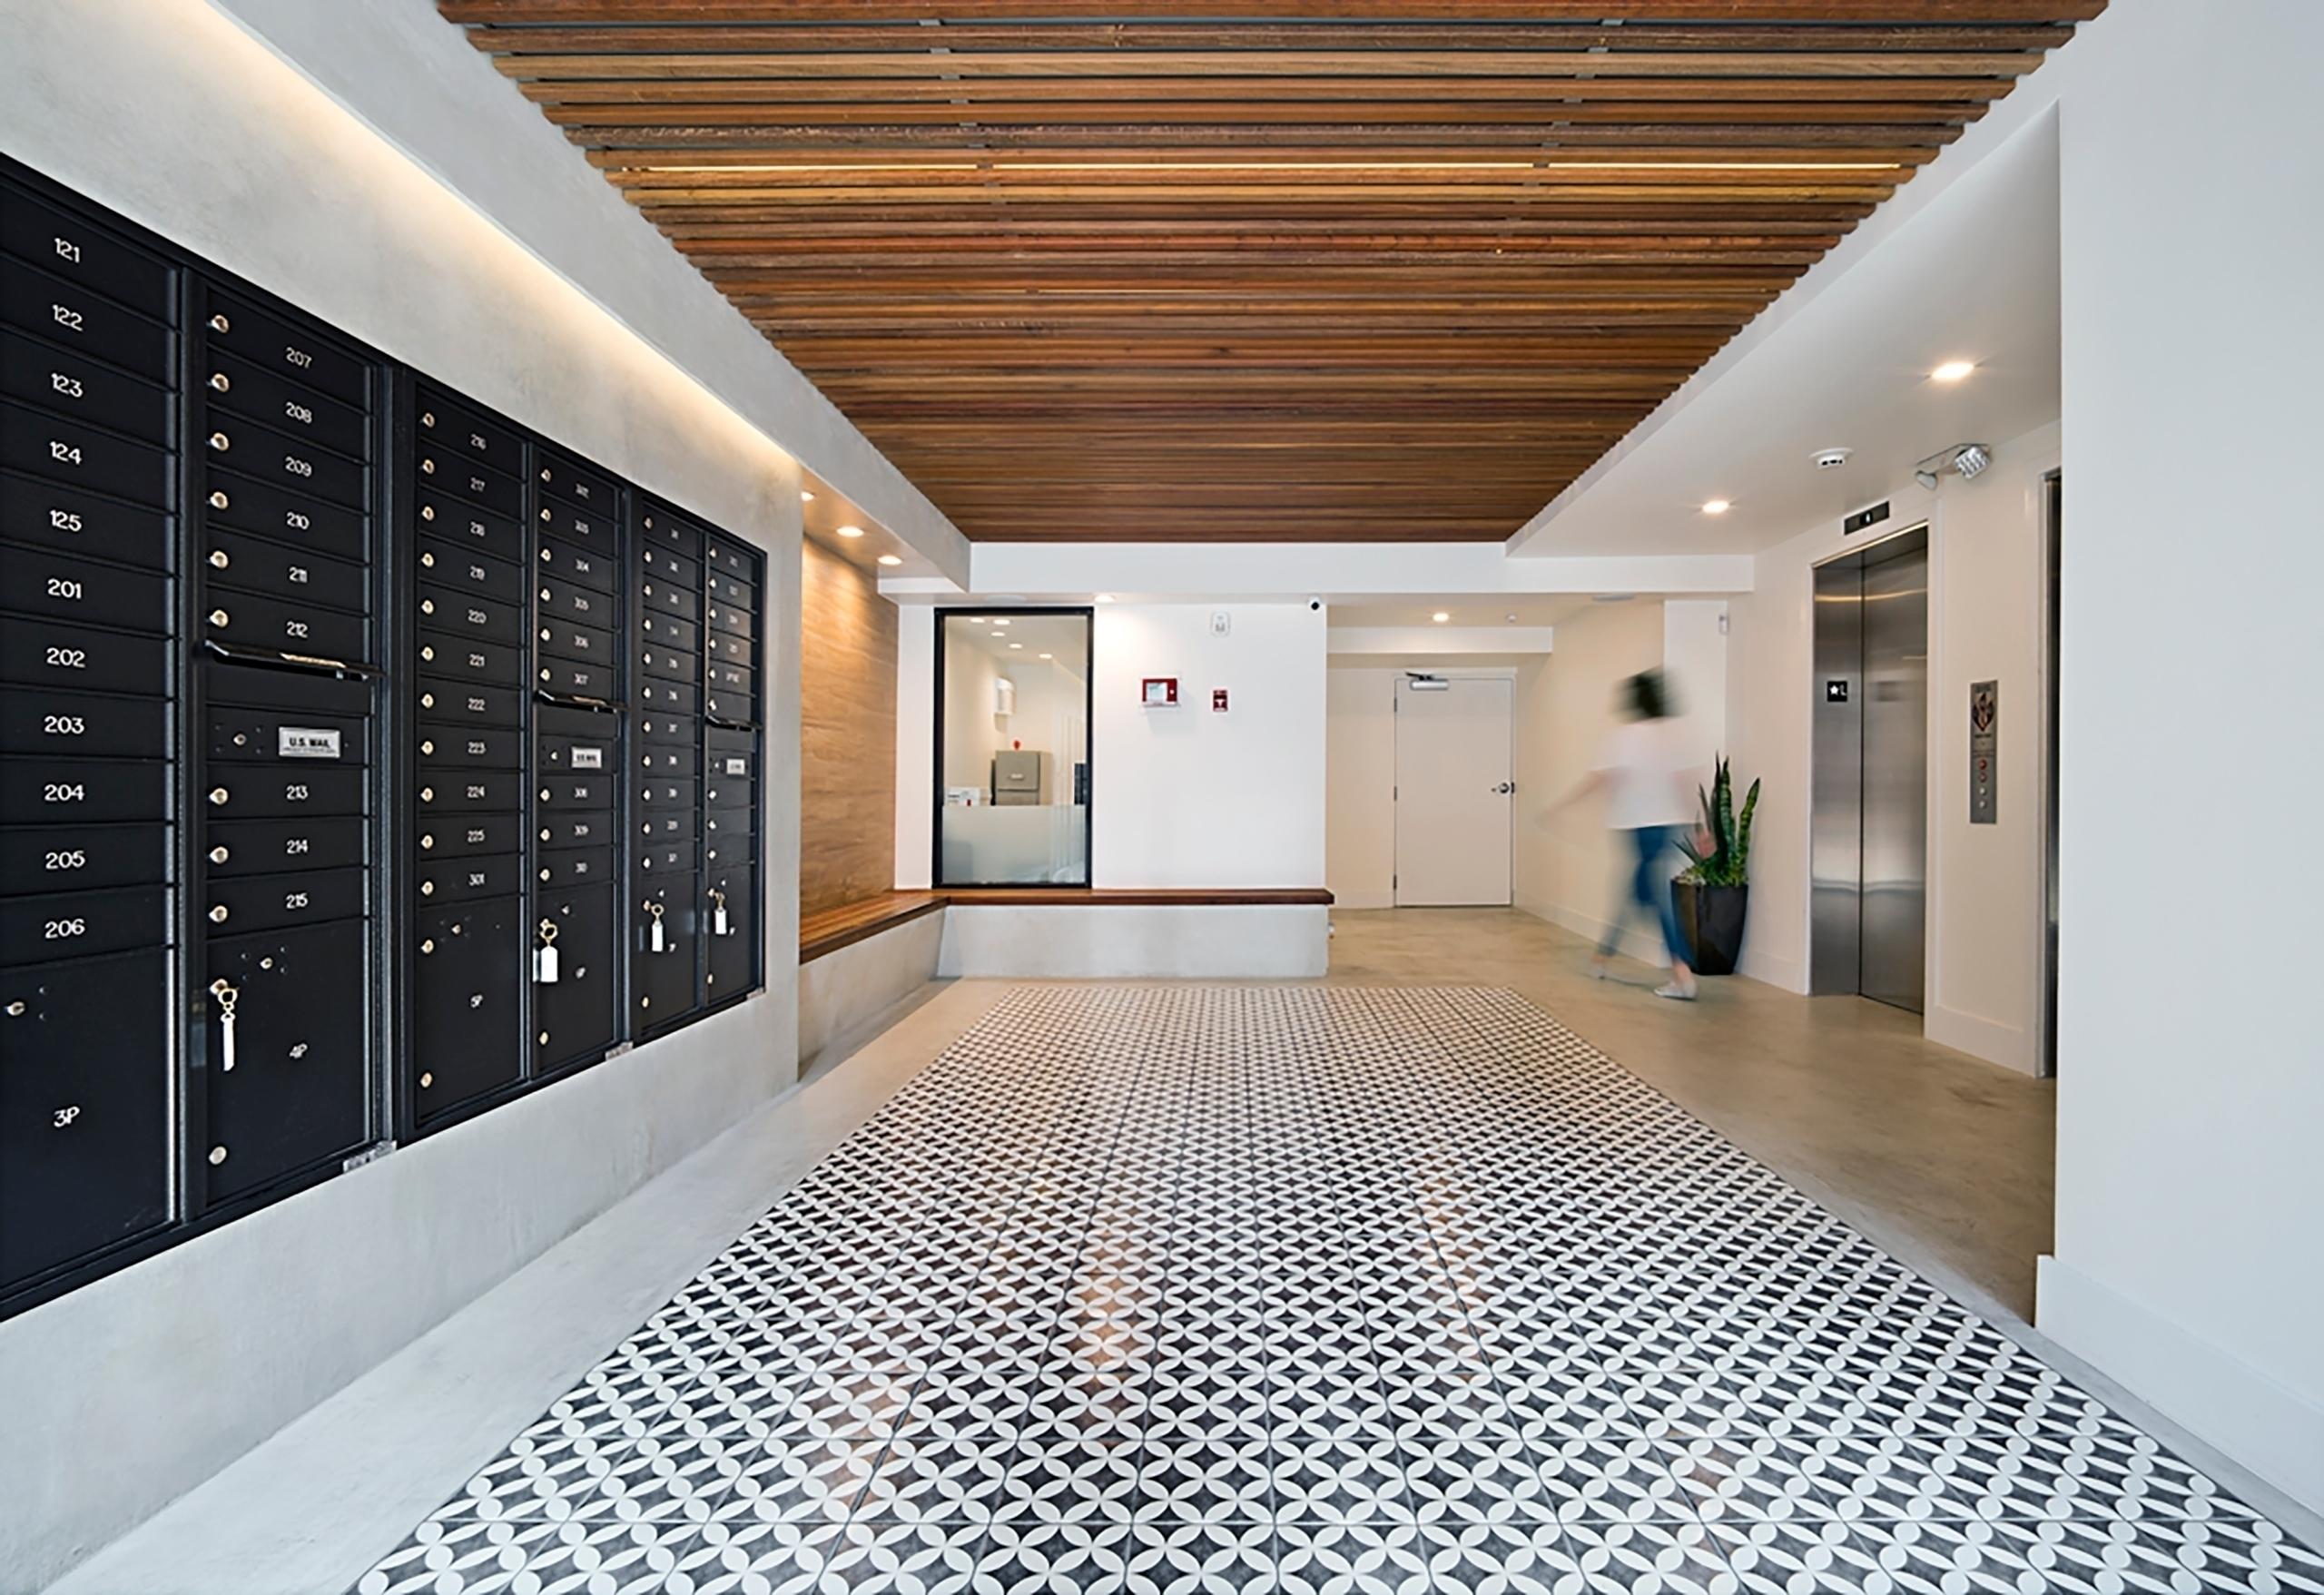 Westwood Riviera Apartments Wes - relativityarchitects | ello